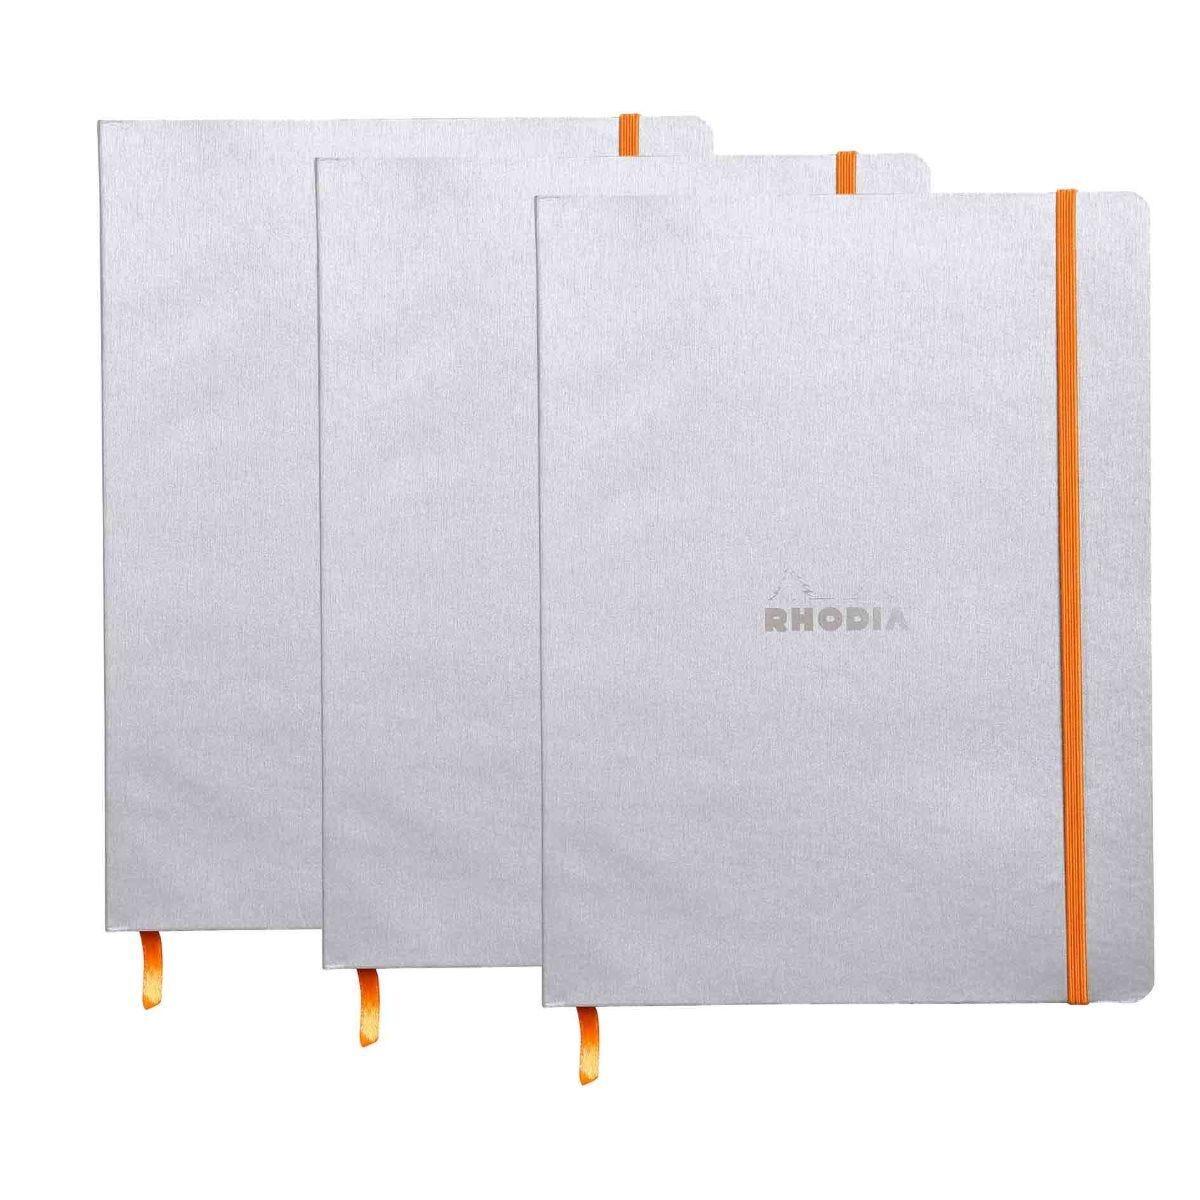 Rhodiarama B5 Ruled Notebook Silver